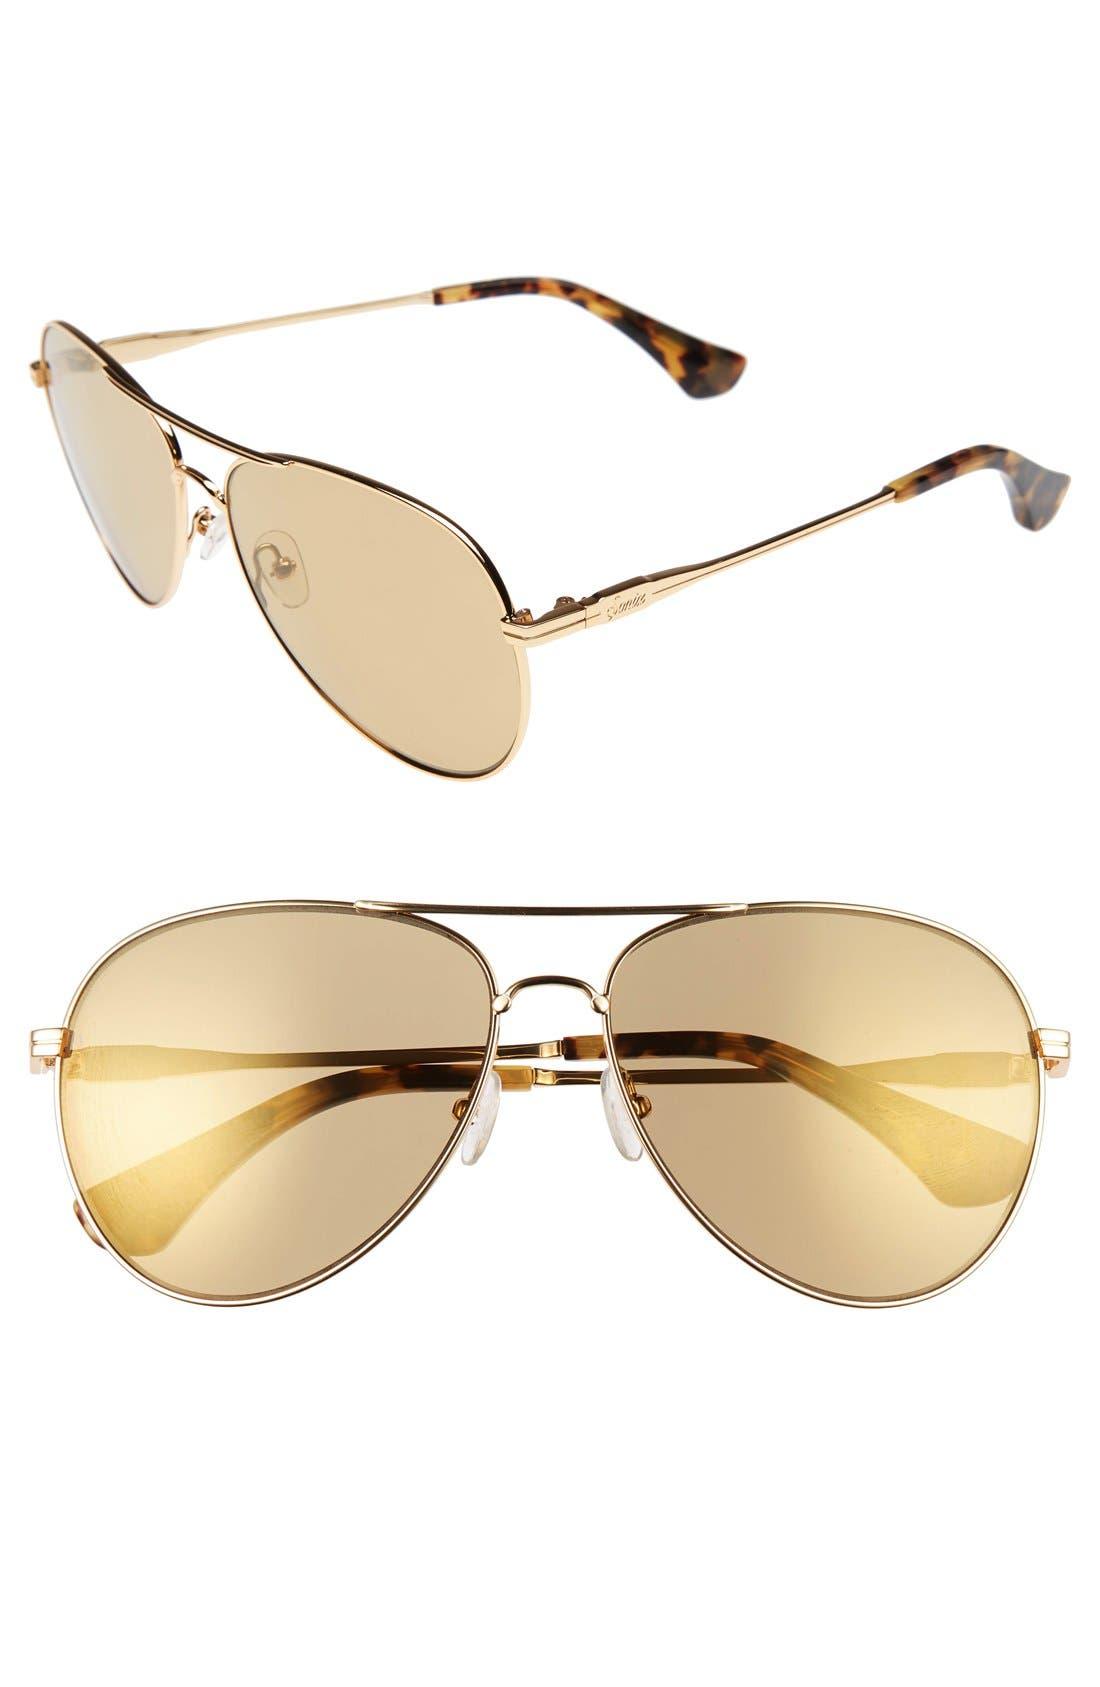 Lodi 62mm Mirrored Aviator Sunglasses,                             Main thumbnail 5, color,